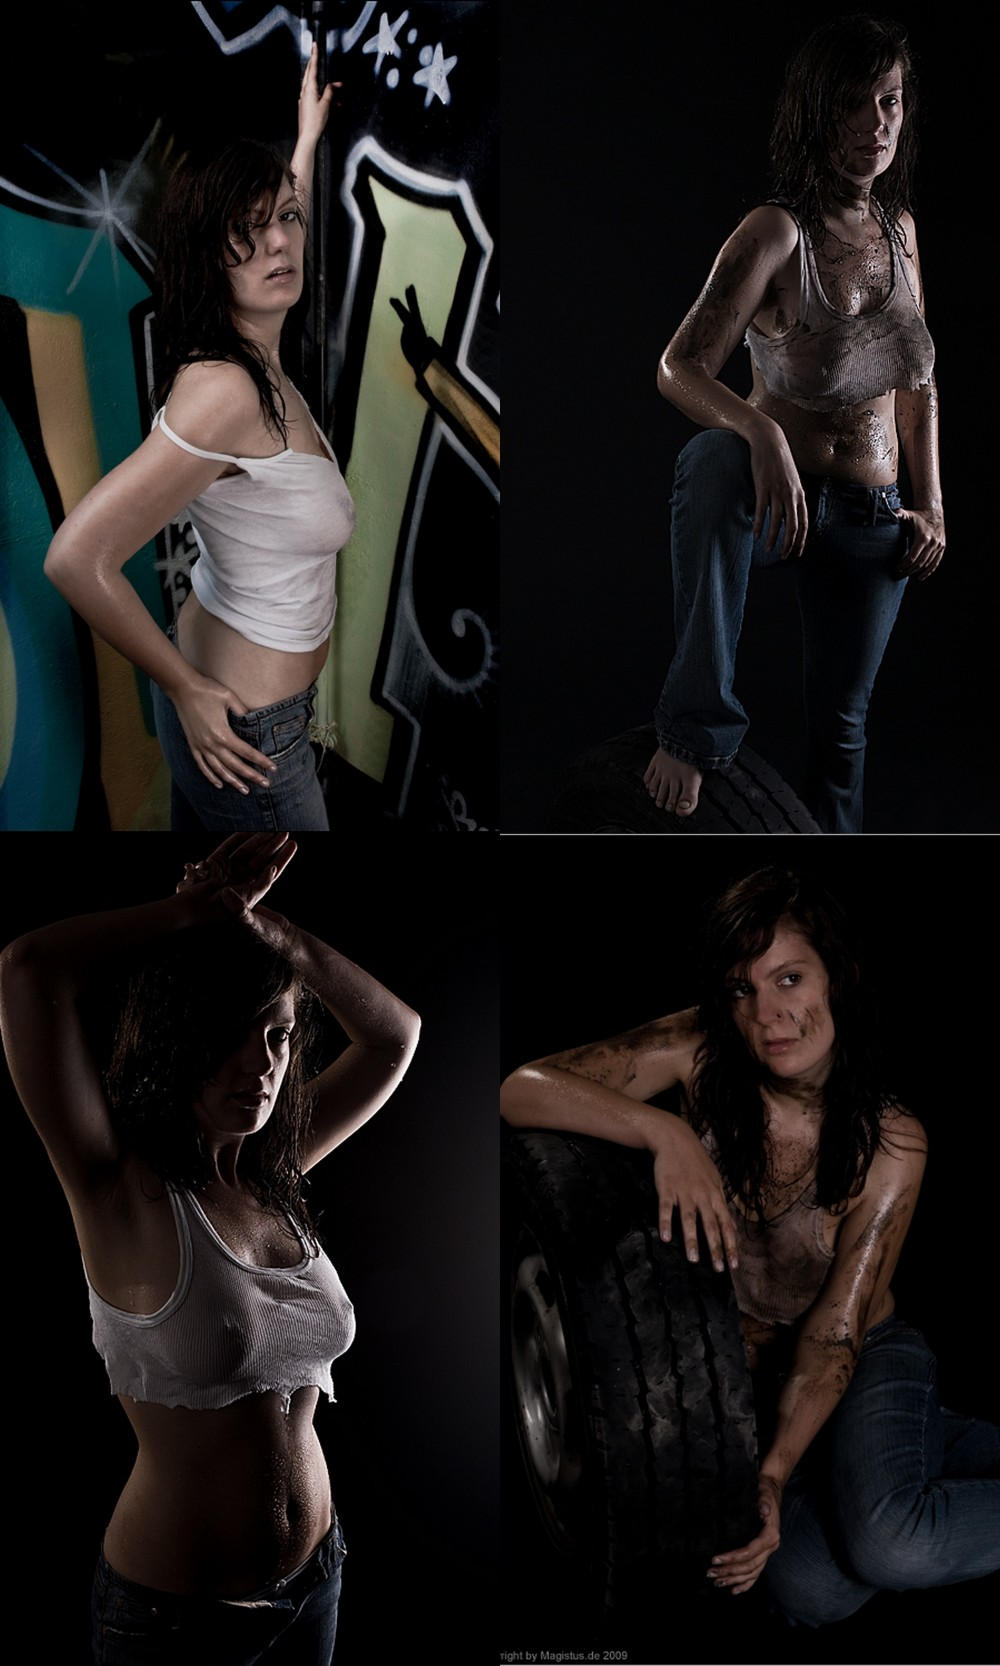 copyright by Magistus Fotografie 2009